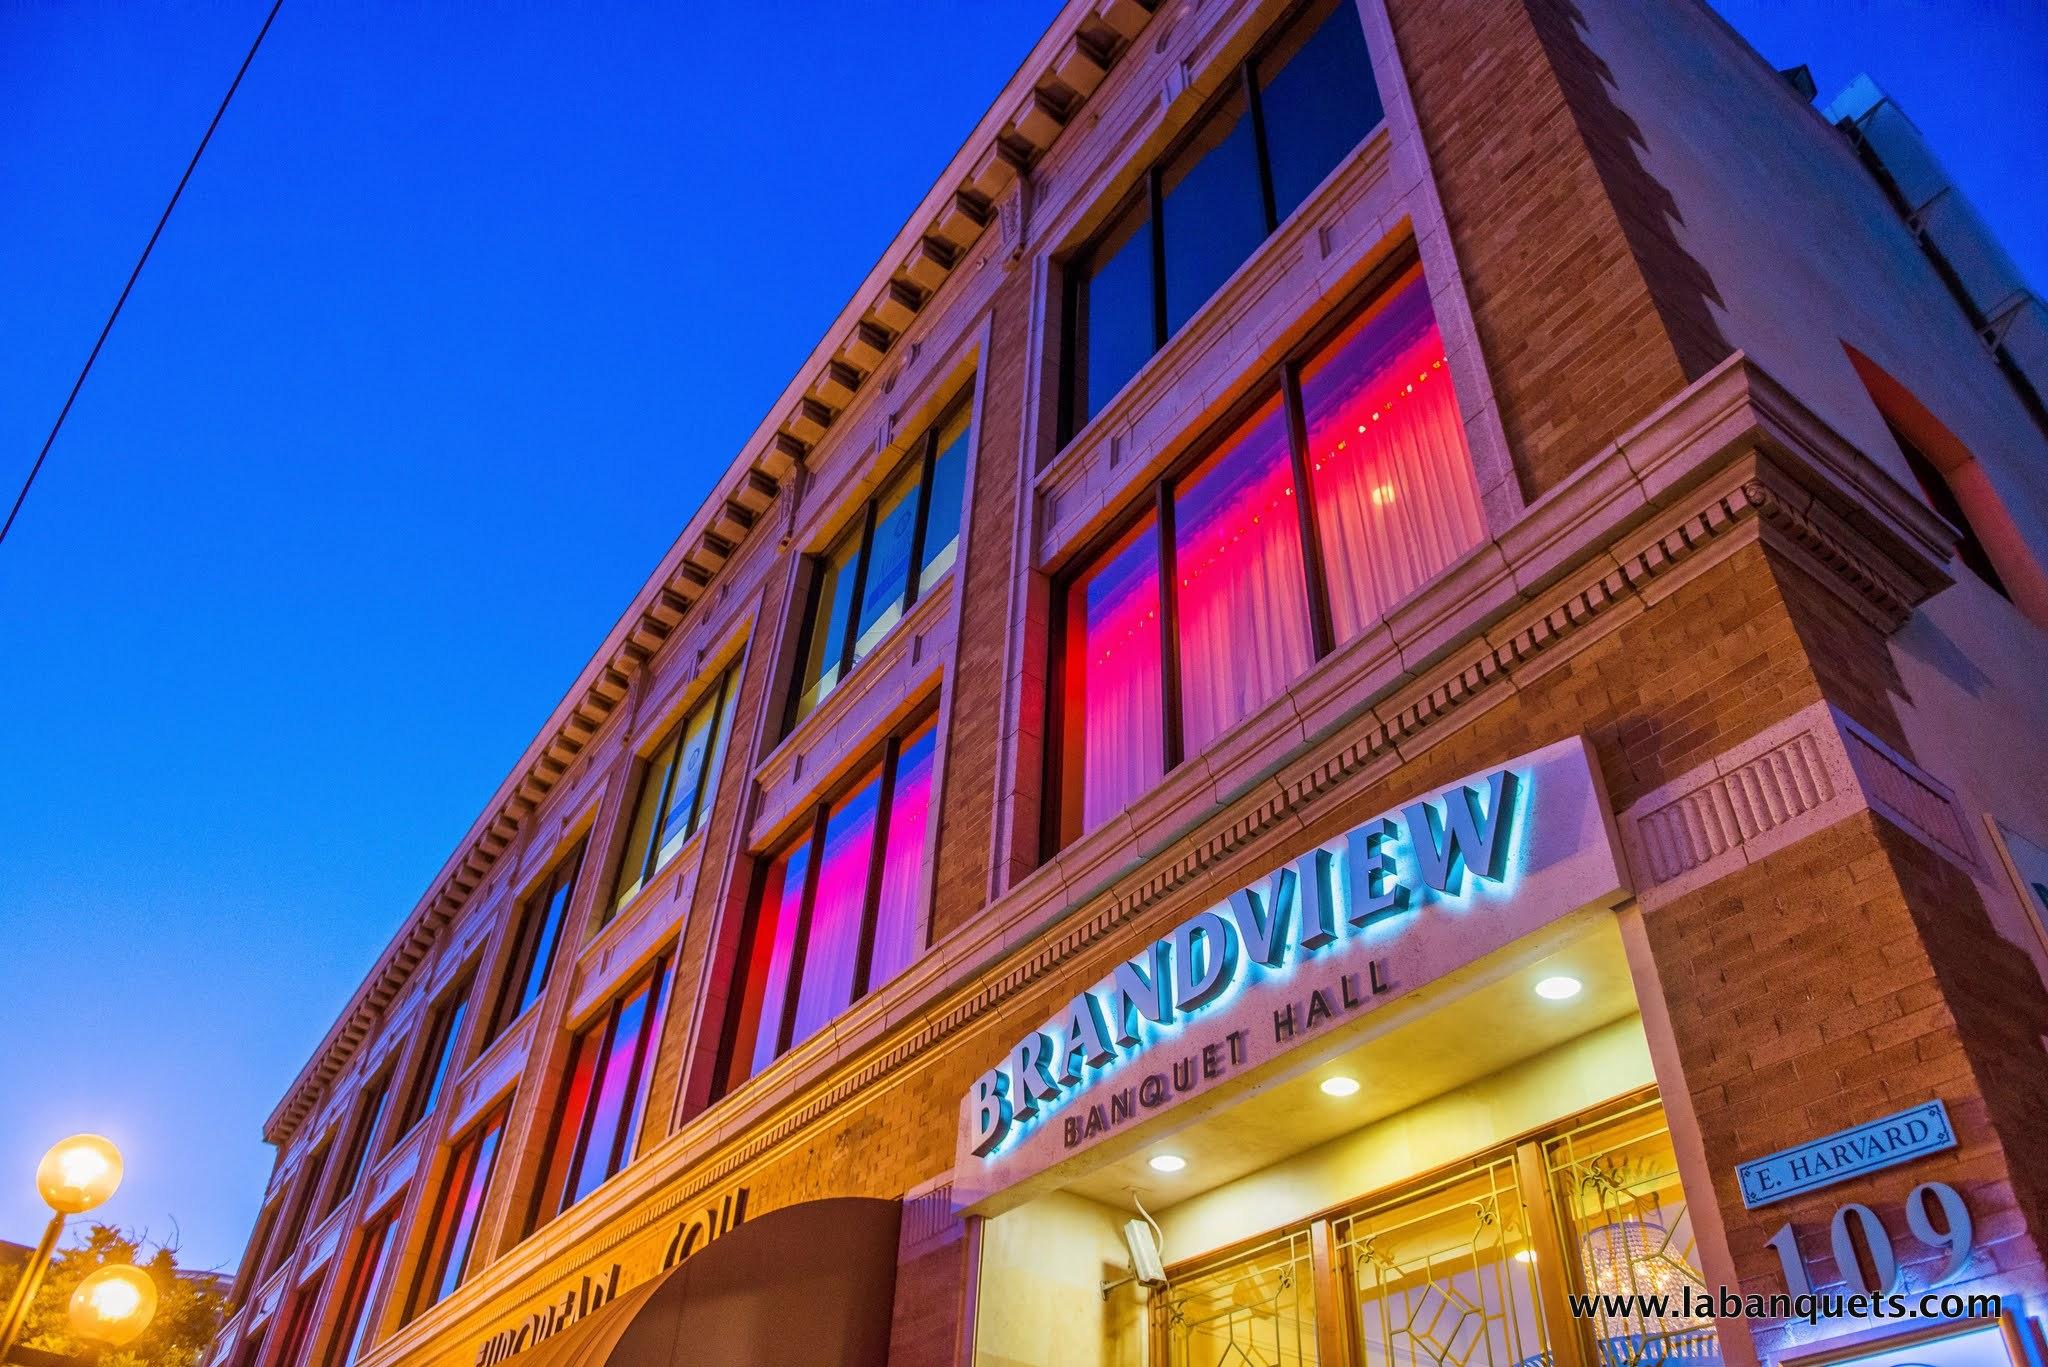 Brandview Ballroom Banquet Hall